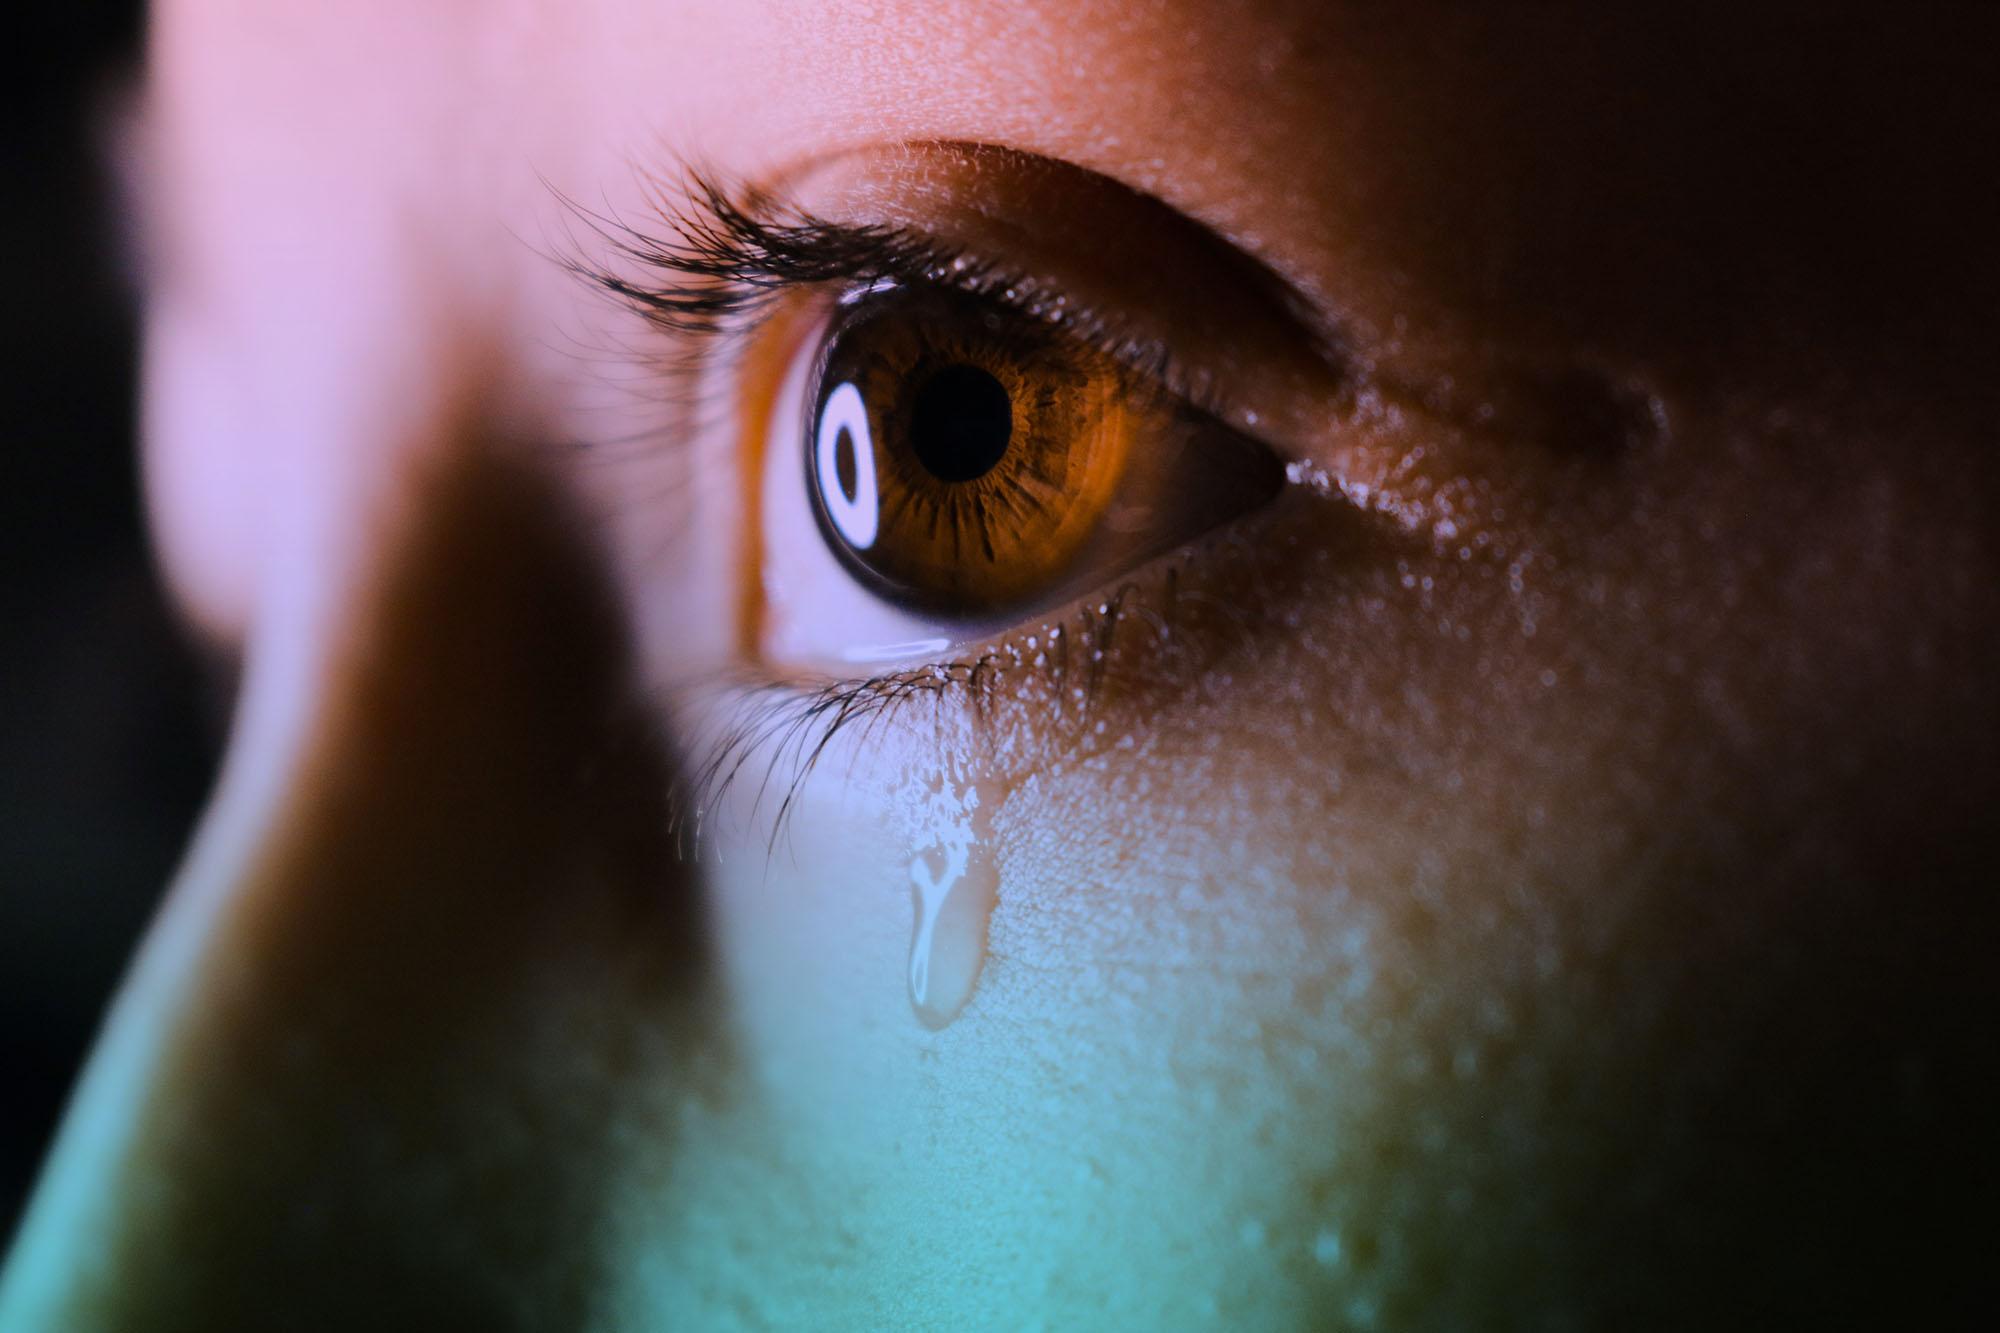 Où sécher tes larmes ?